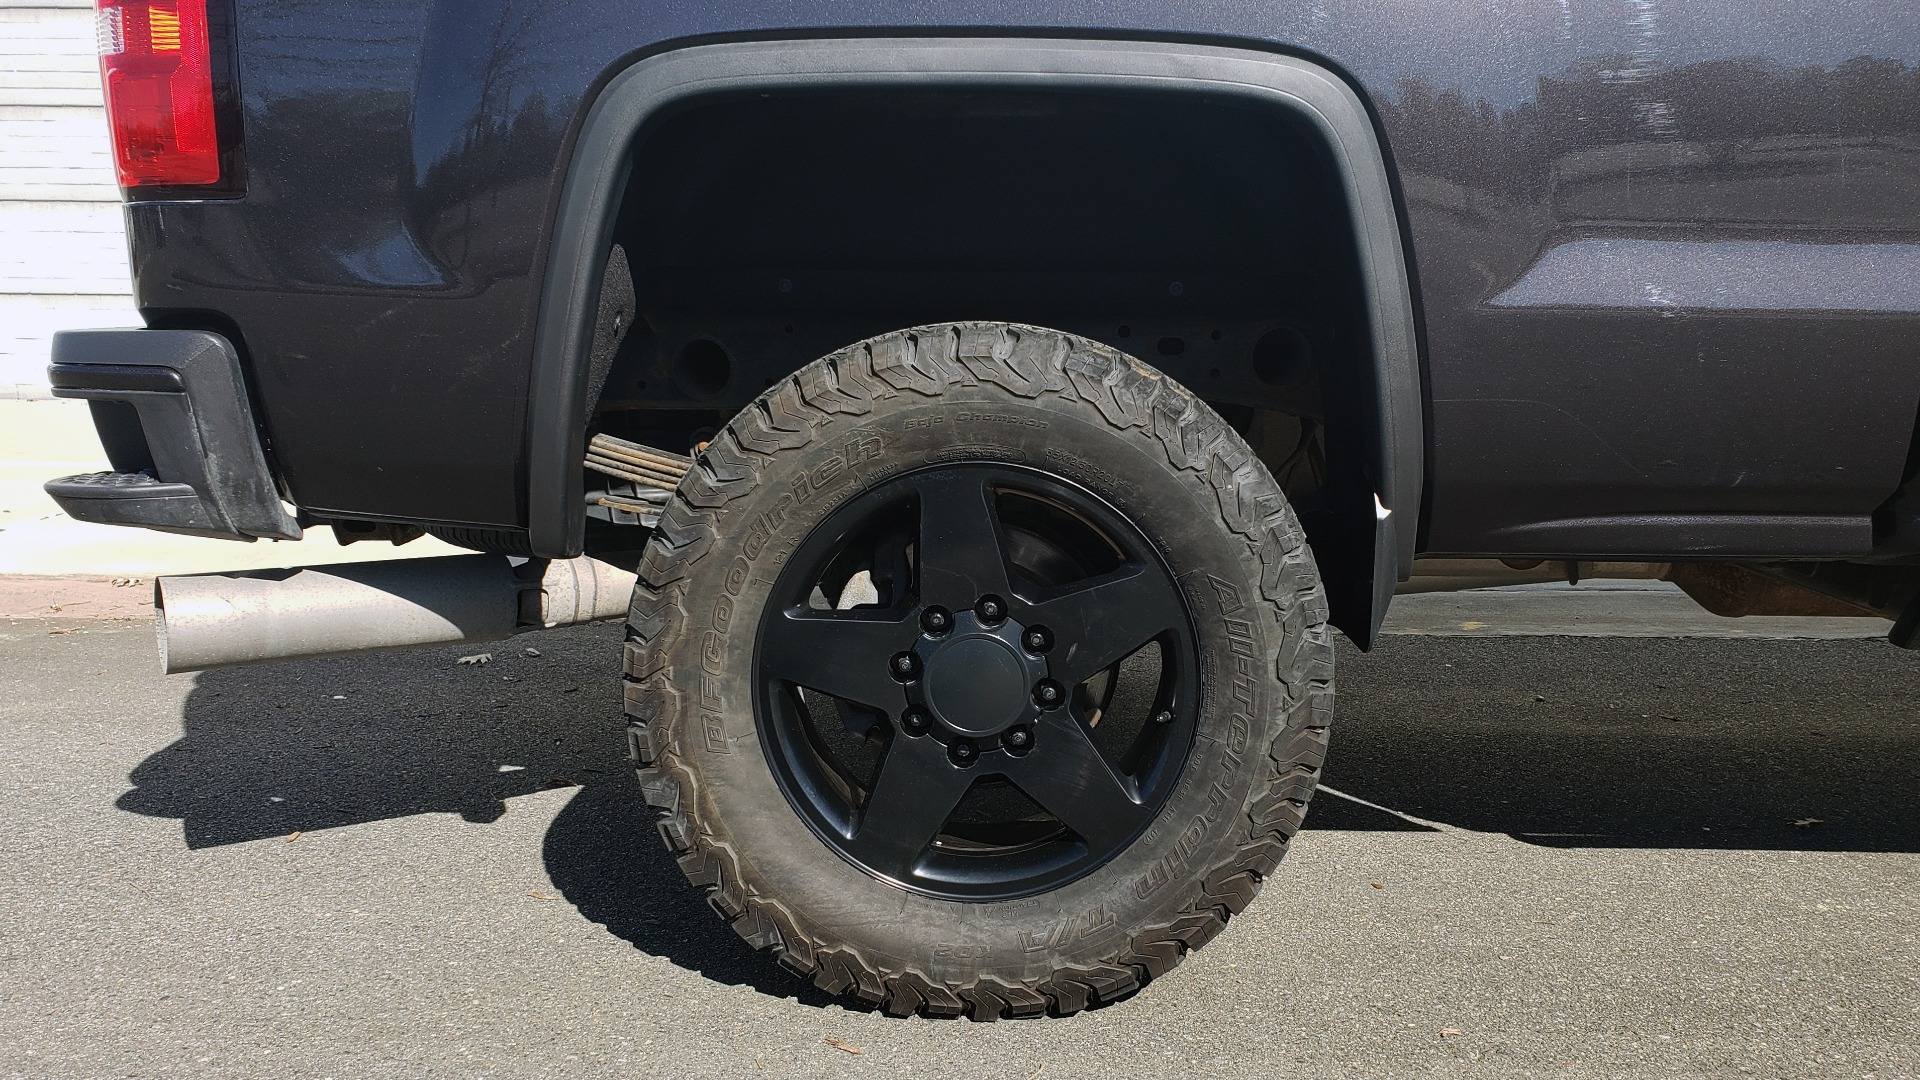 Used 2015 GMC SIERRA 2500HD DENALI 4WD CREWCAB / 6.6L DURAMAX / 6-SPD AUTO / NAV / BOSE for sale $50,995 at Formula Imports in Charlotte NC 28227 90